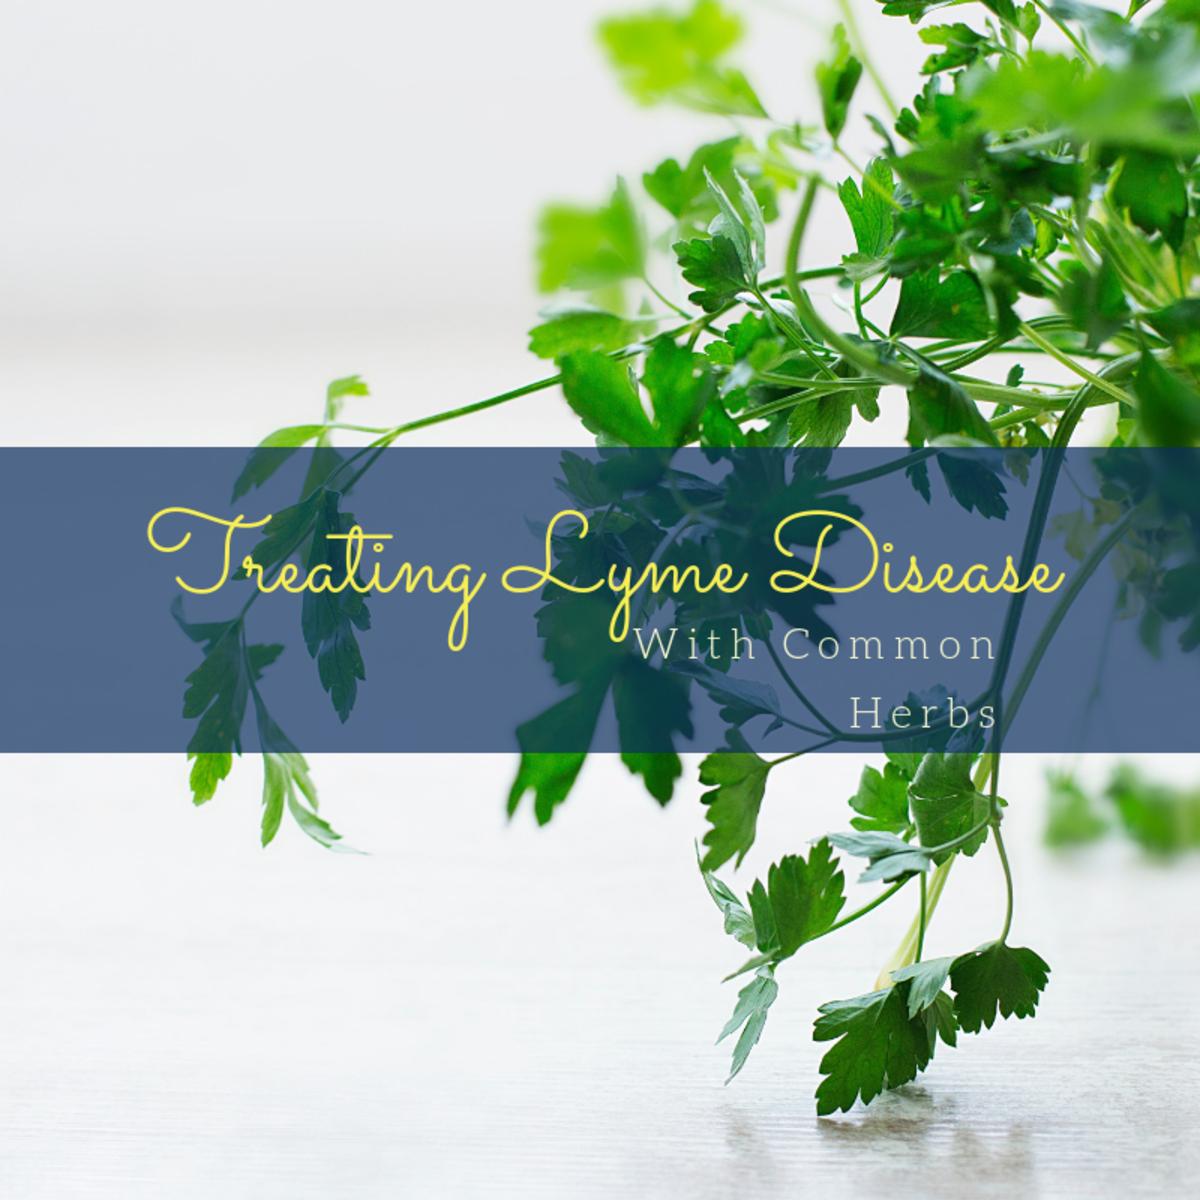 Common Herbs Used to Treat Lyme Disease | RemedyGrove